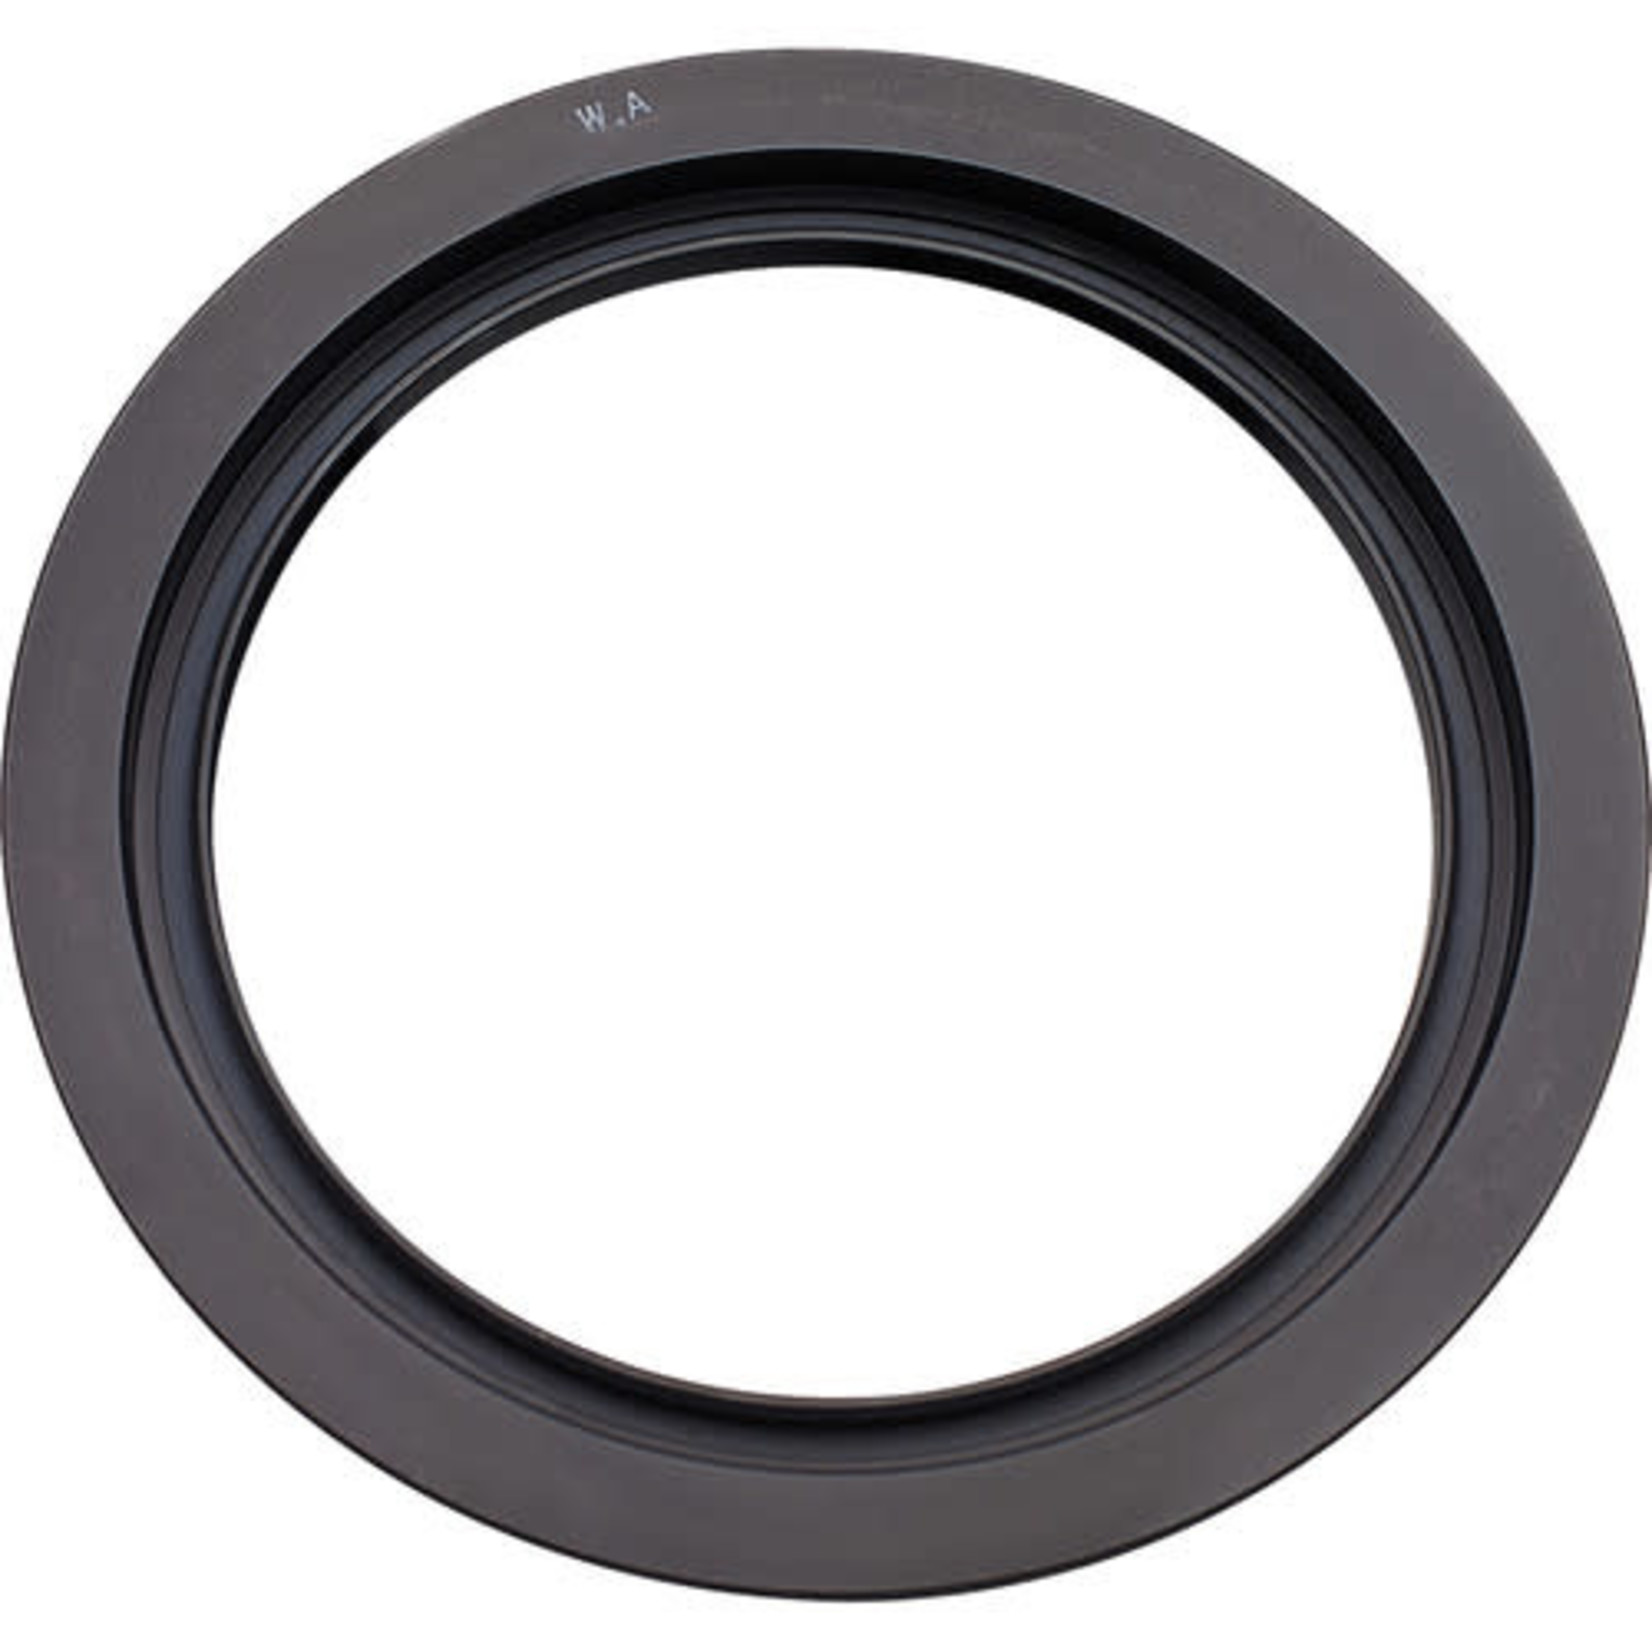 Lee LEE Filters 67mm Wide-Angle Lens Adapter Ring for 100mm System Filter Holder